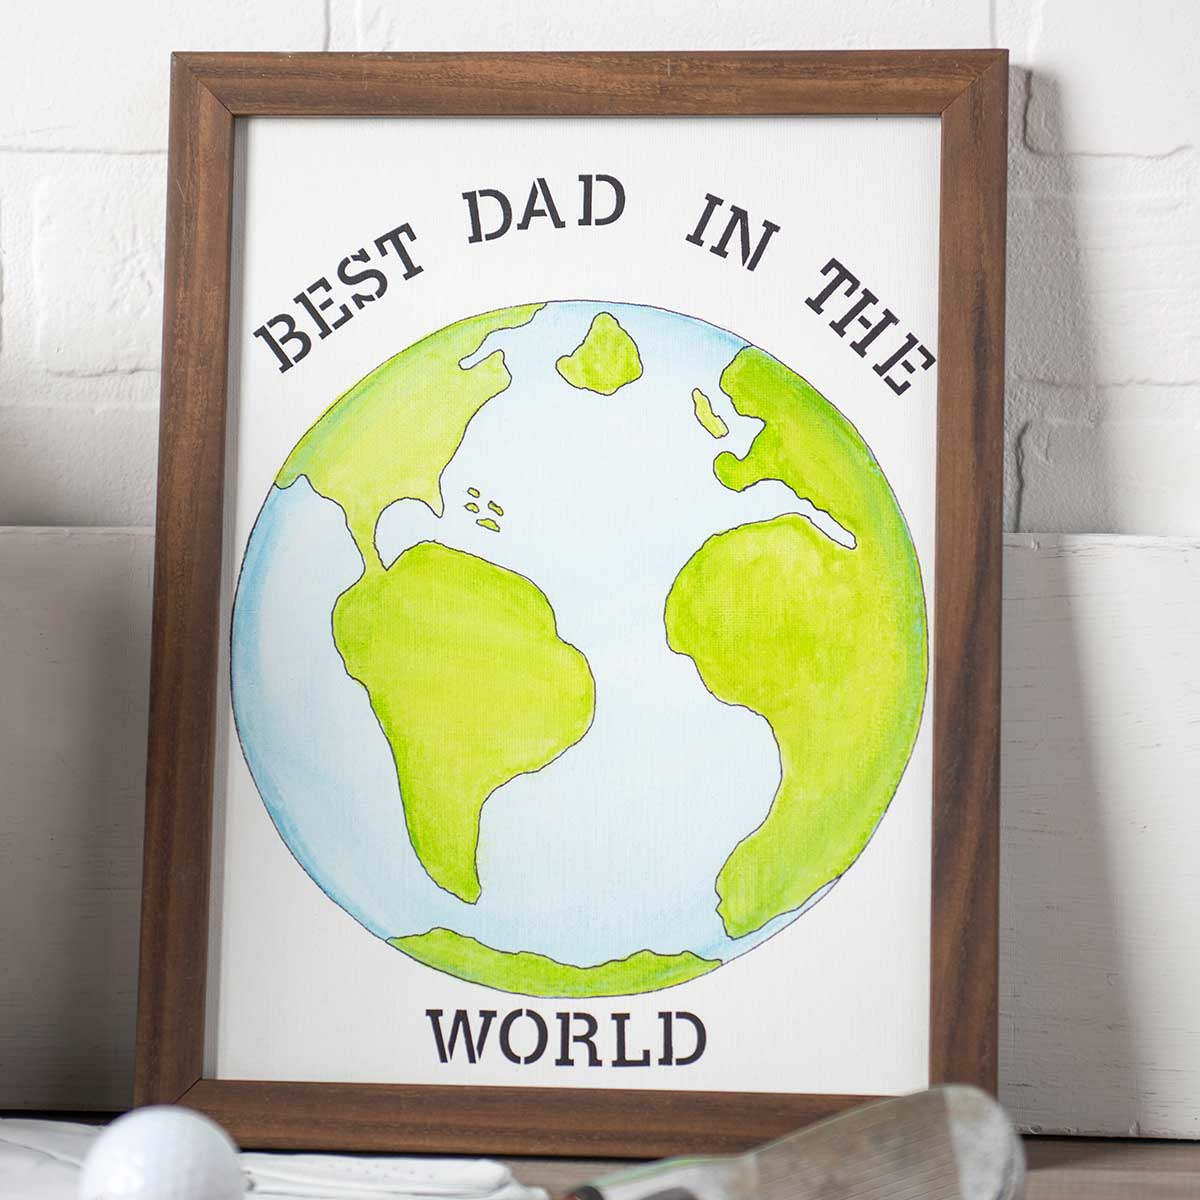 Best Dad in the World Framed Art DIY